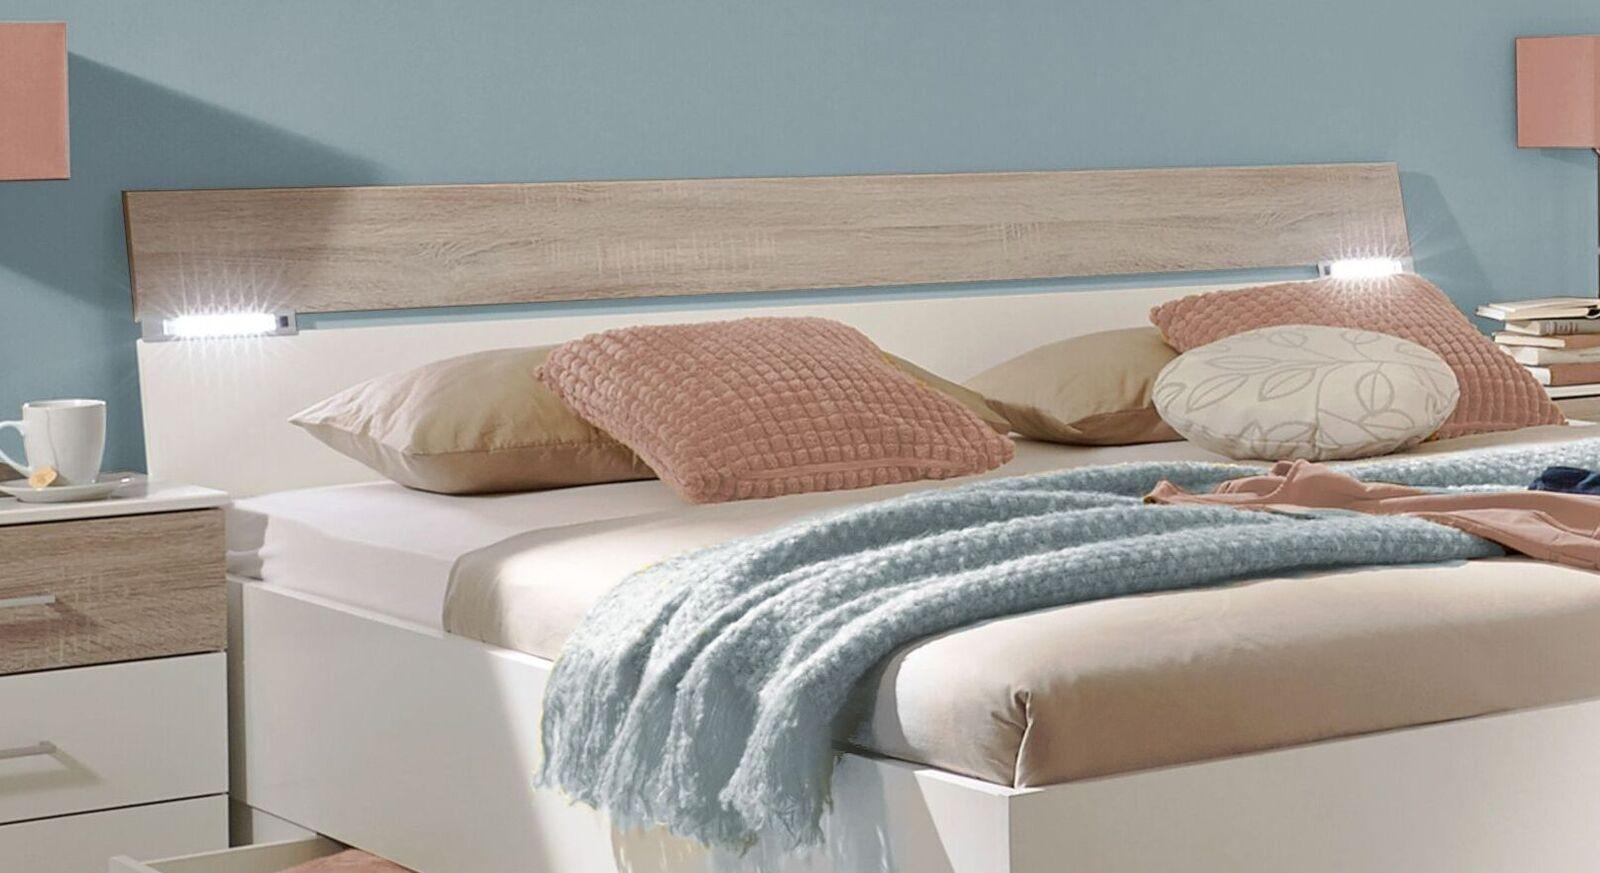 Schubkasten-Bett Kormoran mit stilvoller Beleuchtung